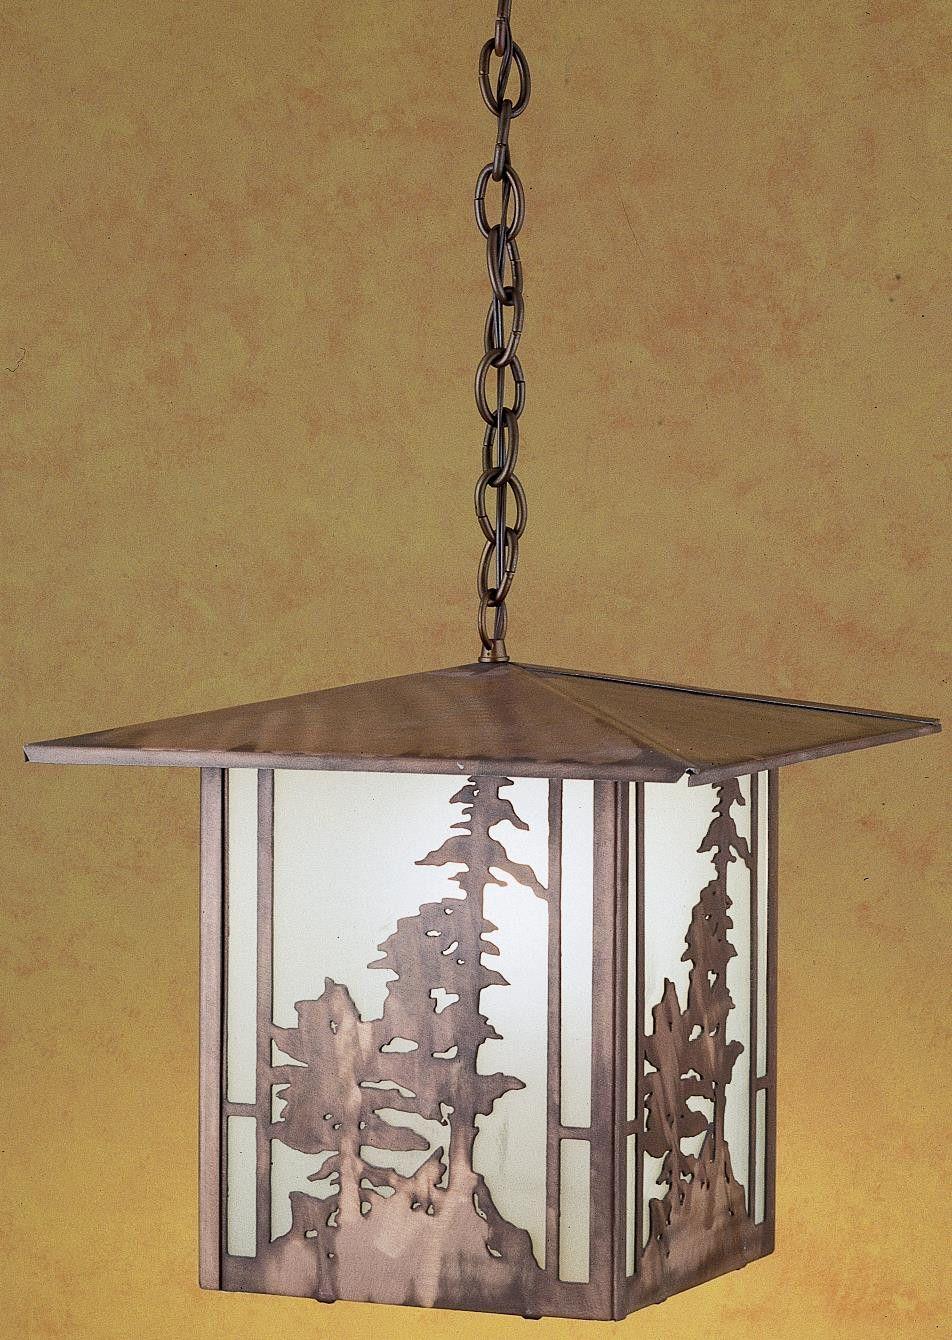 15 Inch Sq Tall Pines Lantern Pendant